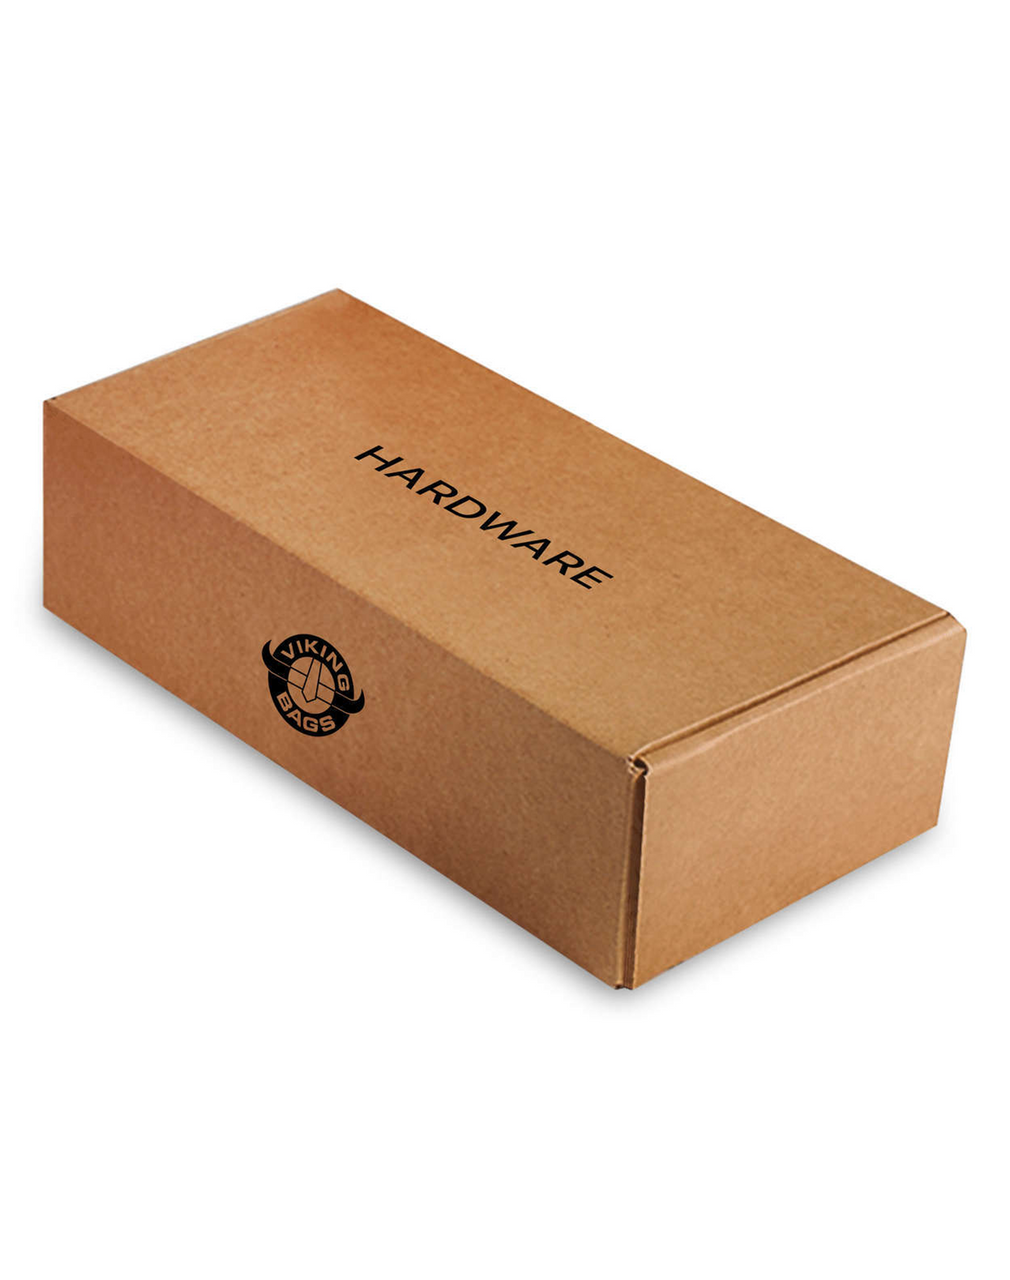 Indian Chief Classic Medium Plain Single Strap Motorcycle Saddlebags Hardware Box